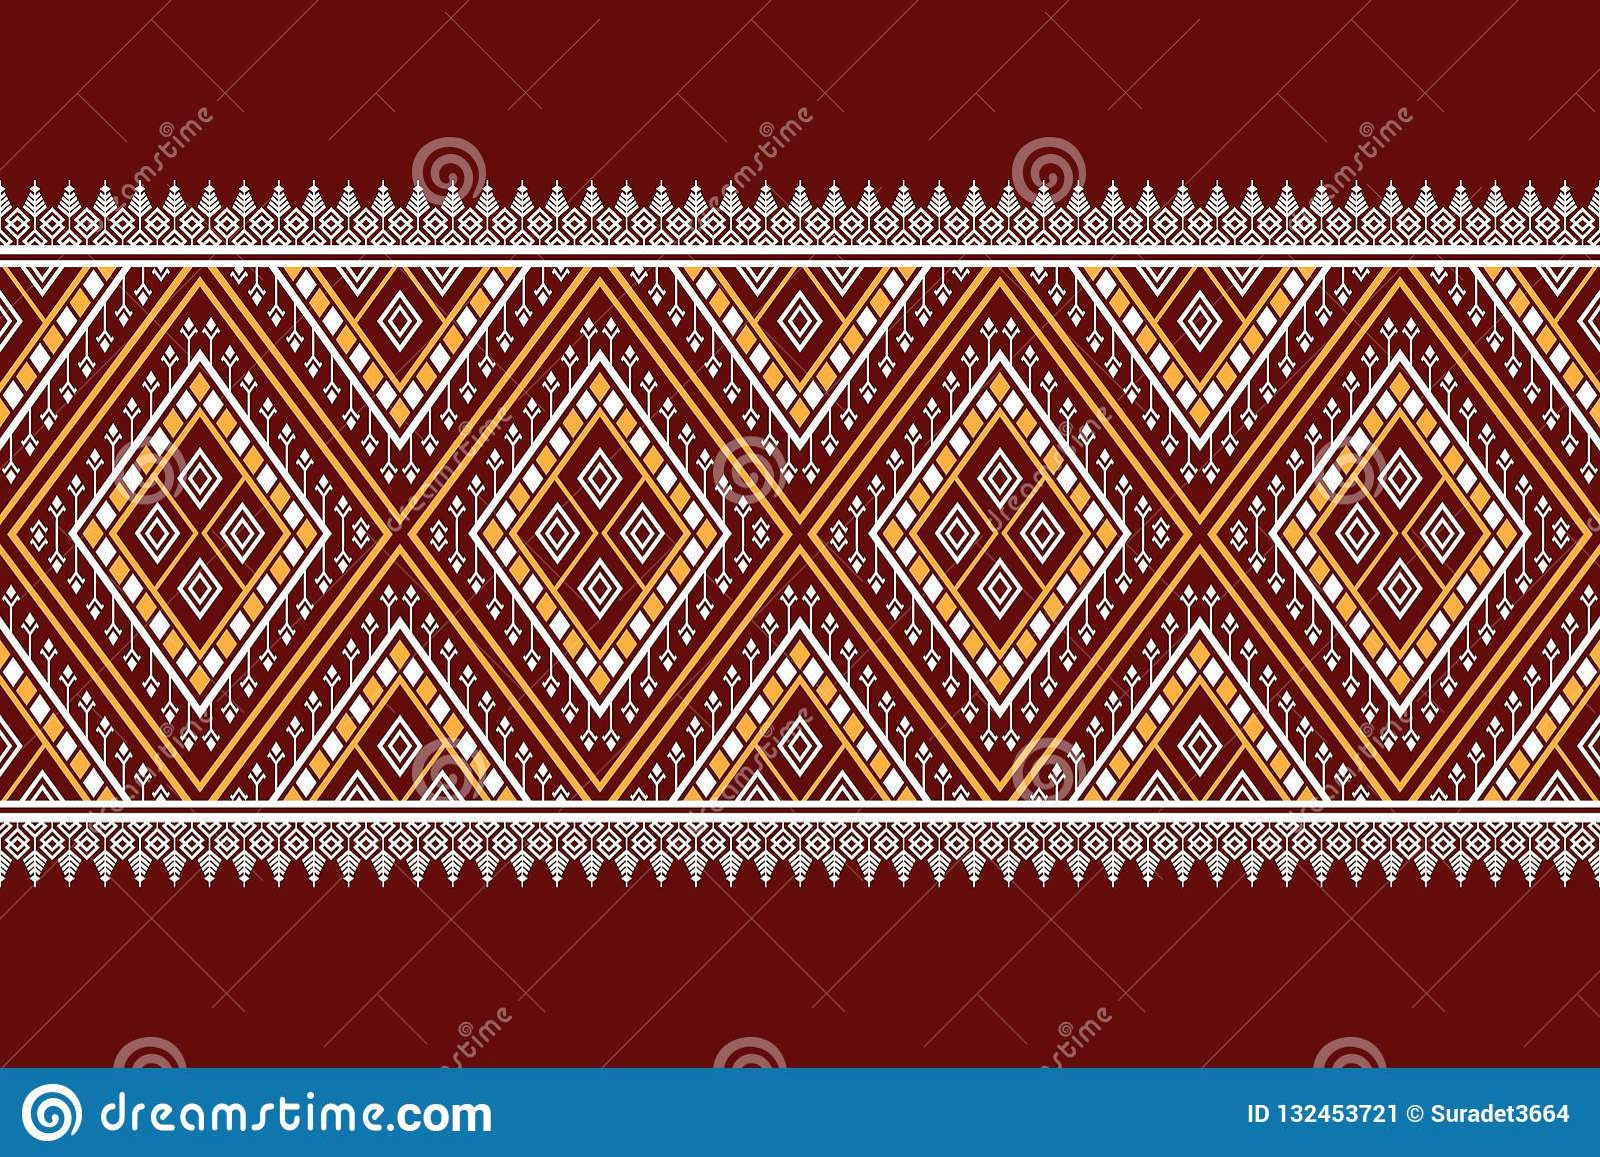 Geometric Ethnic Pattern Traditional Design For Background Carpet Wallpaper Clothing Wrapping Batik Fabric Sarong Vector Illustrat Stock Illustration Illustration Of Geometrical Decorative 132453721